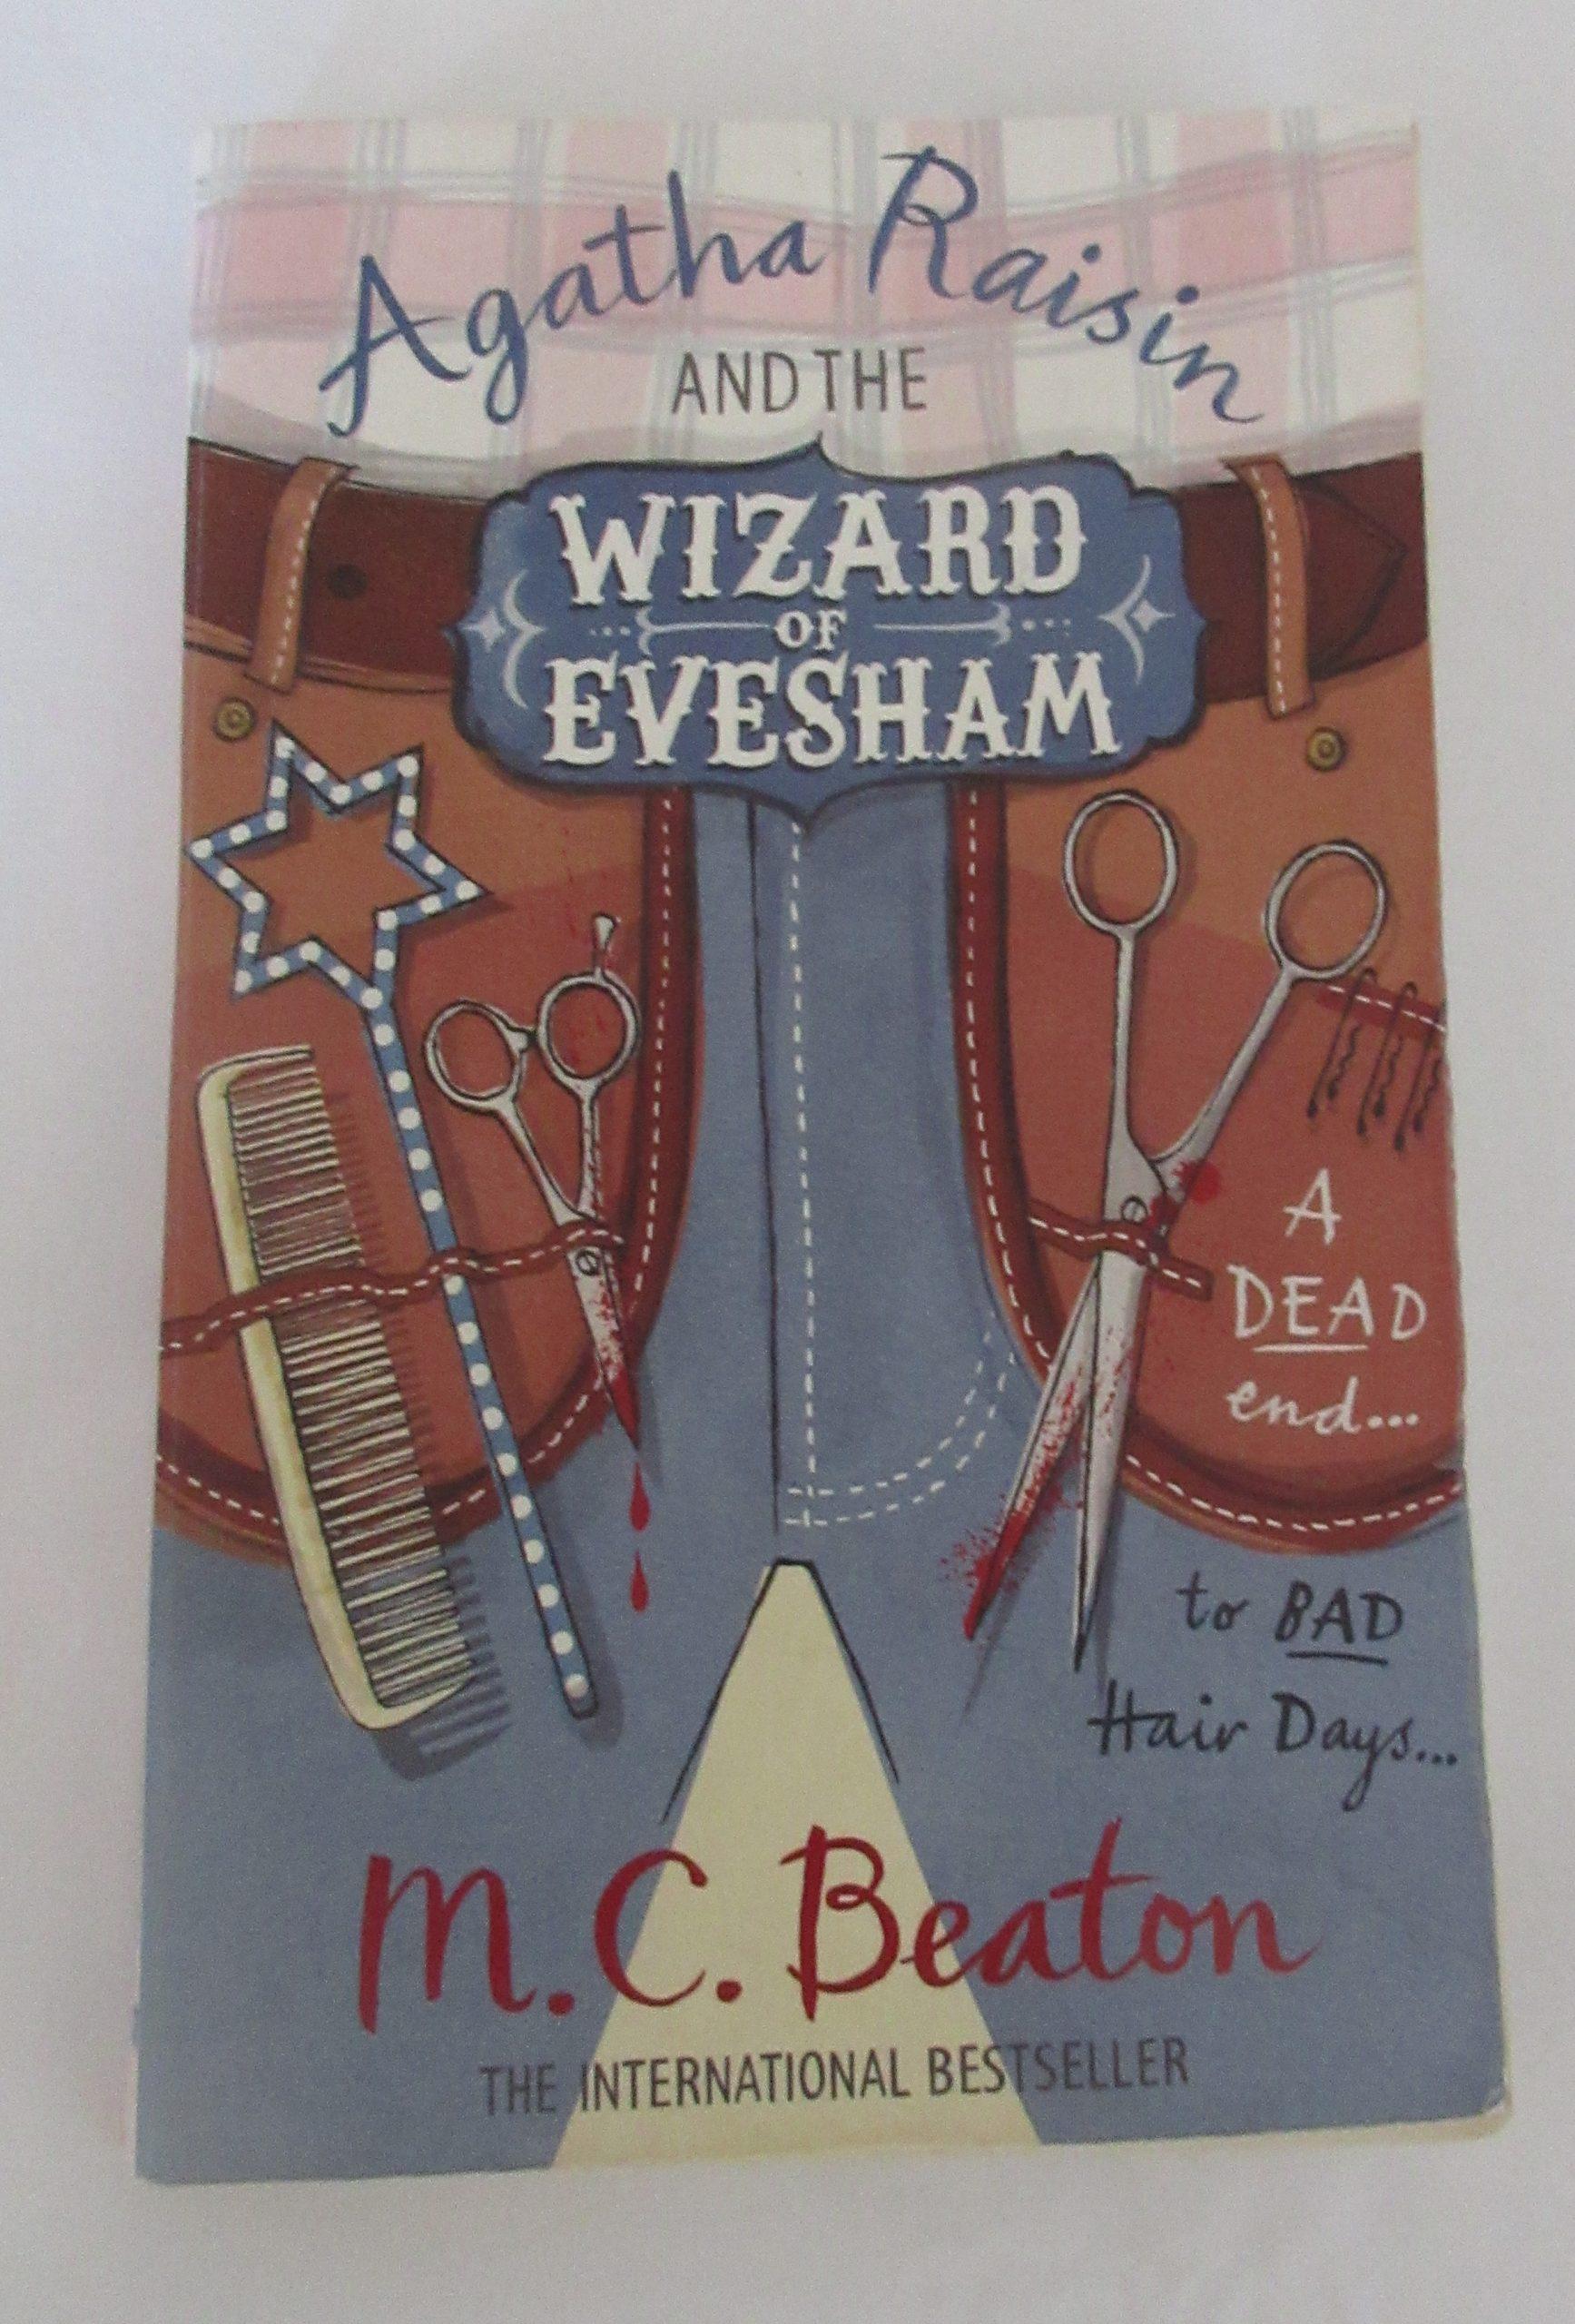 Agatha Raisin and The Wizard of Evesham - photo by Juliamaud